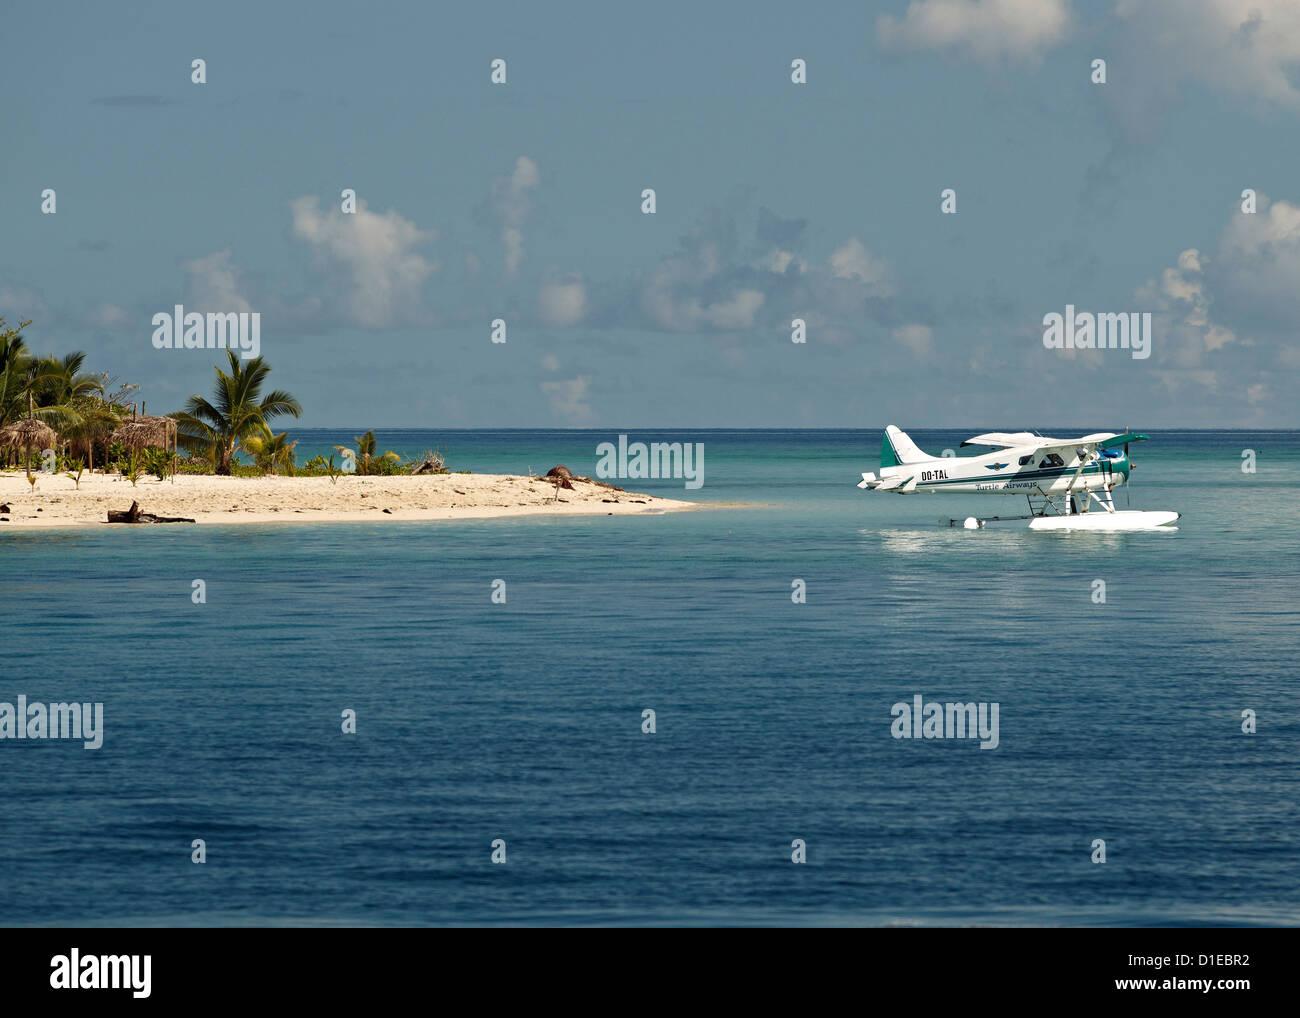 Boat plane off West coast of Viti Levu, Fiji, Pacific Islands, Pacific - Stock Image